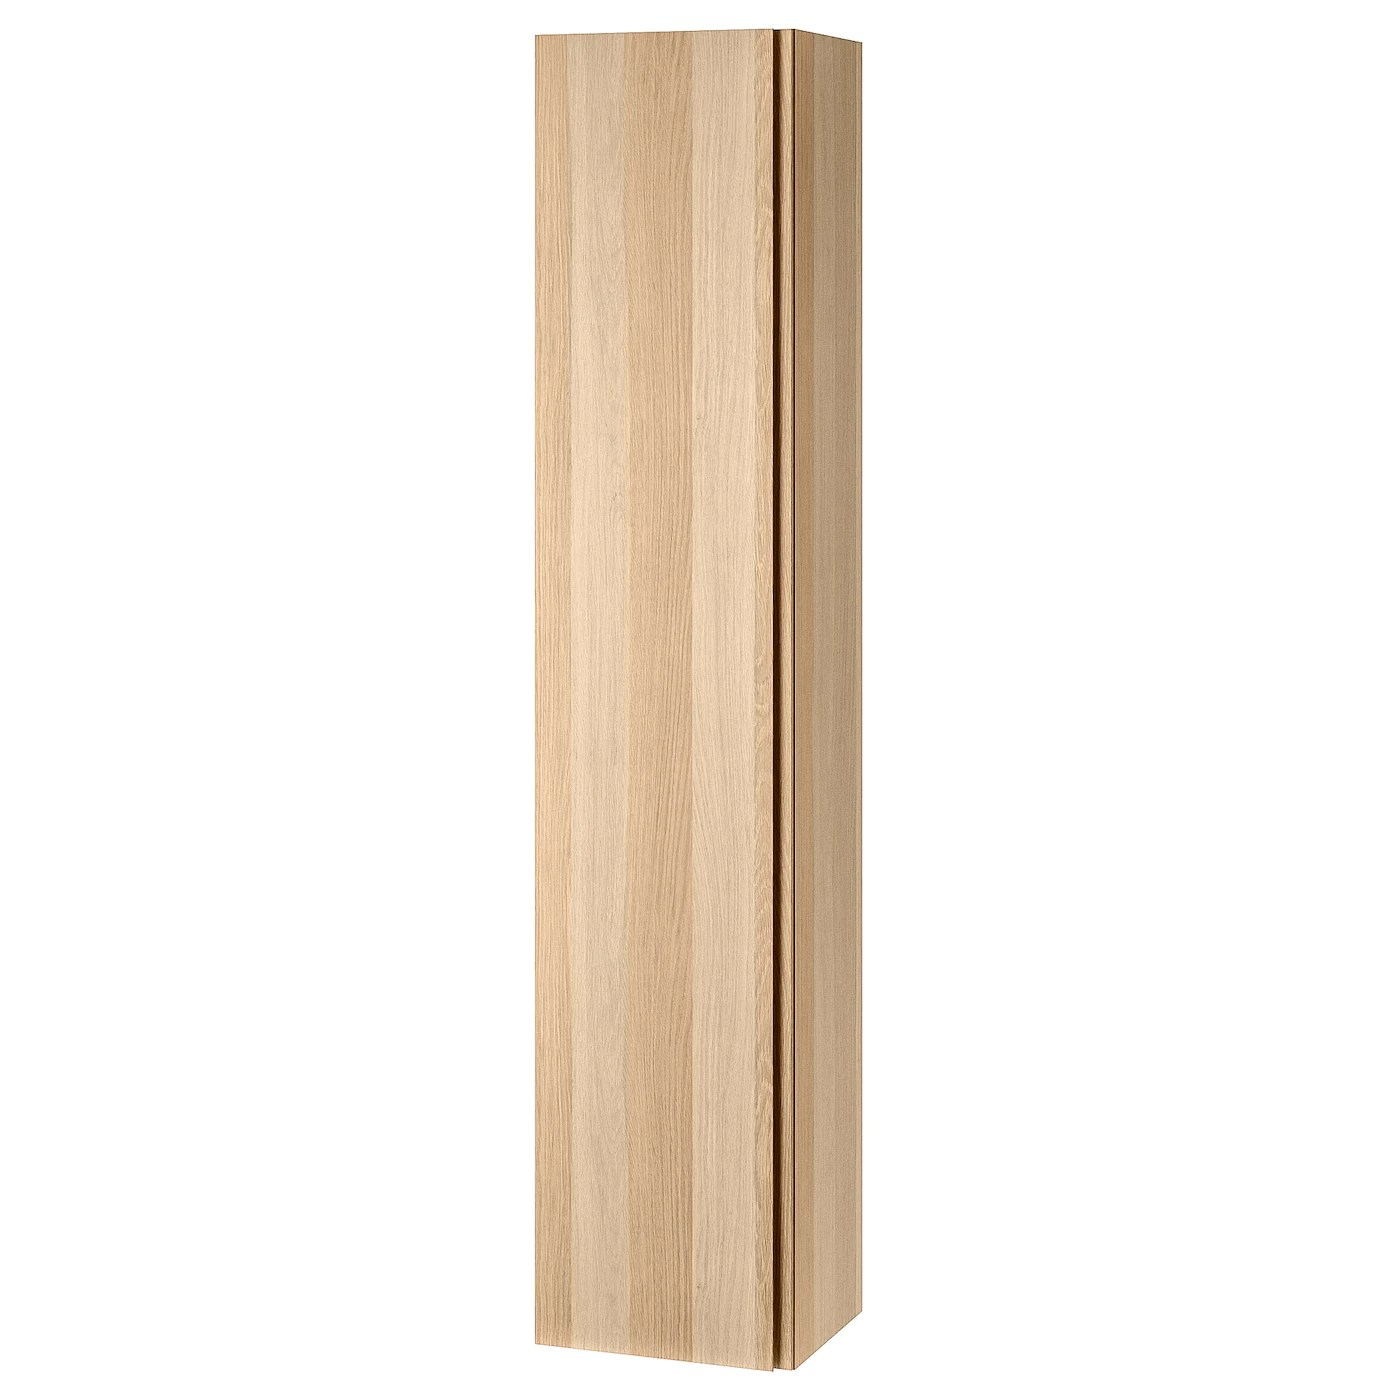 Godmorgon Colonne Effet Chene Blanchi 40x32x192 Cm Ikea